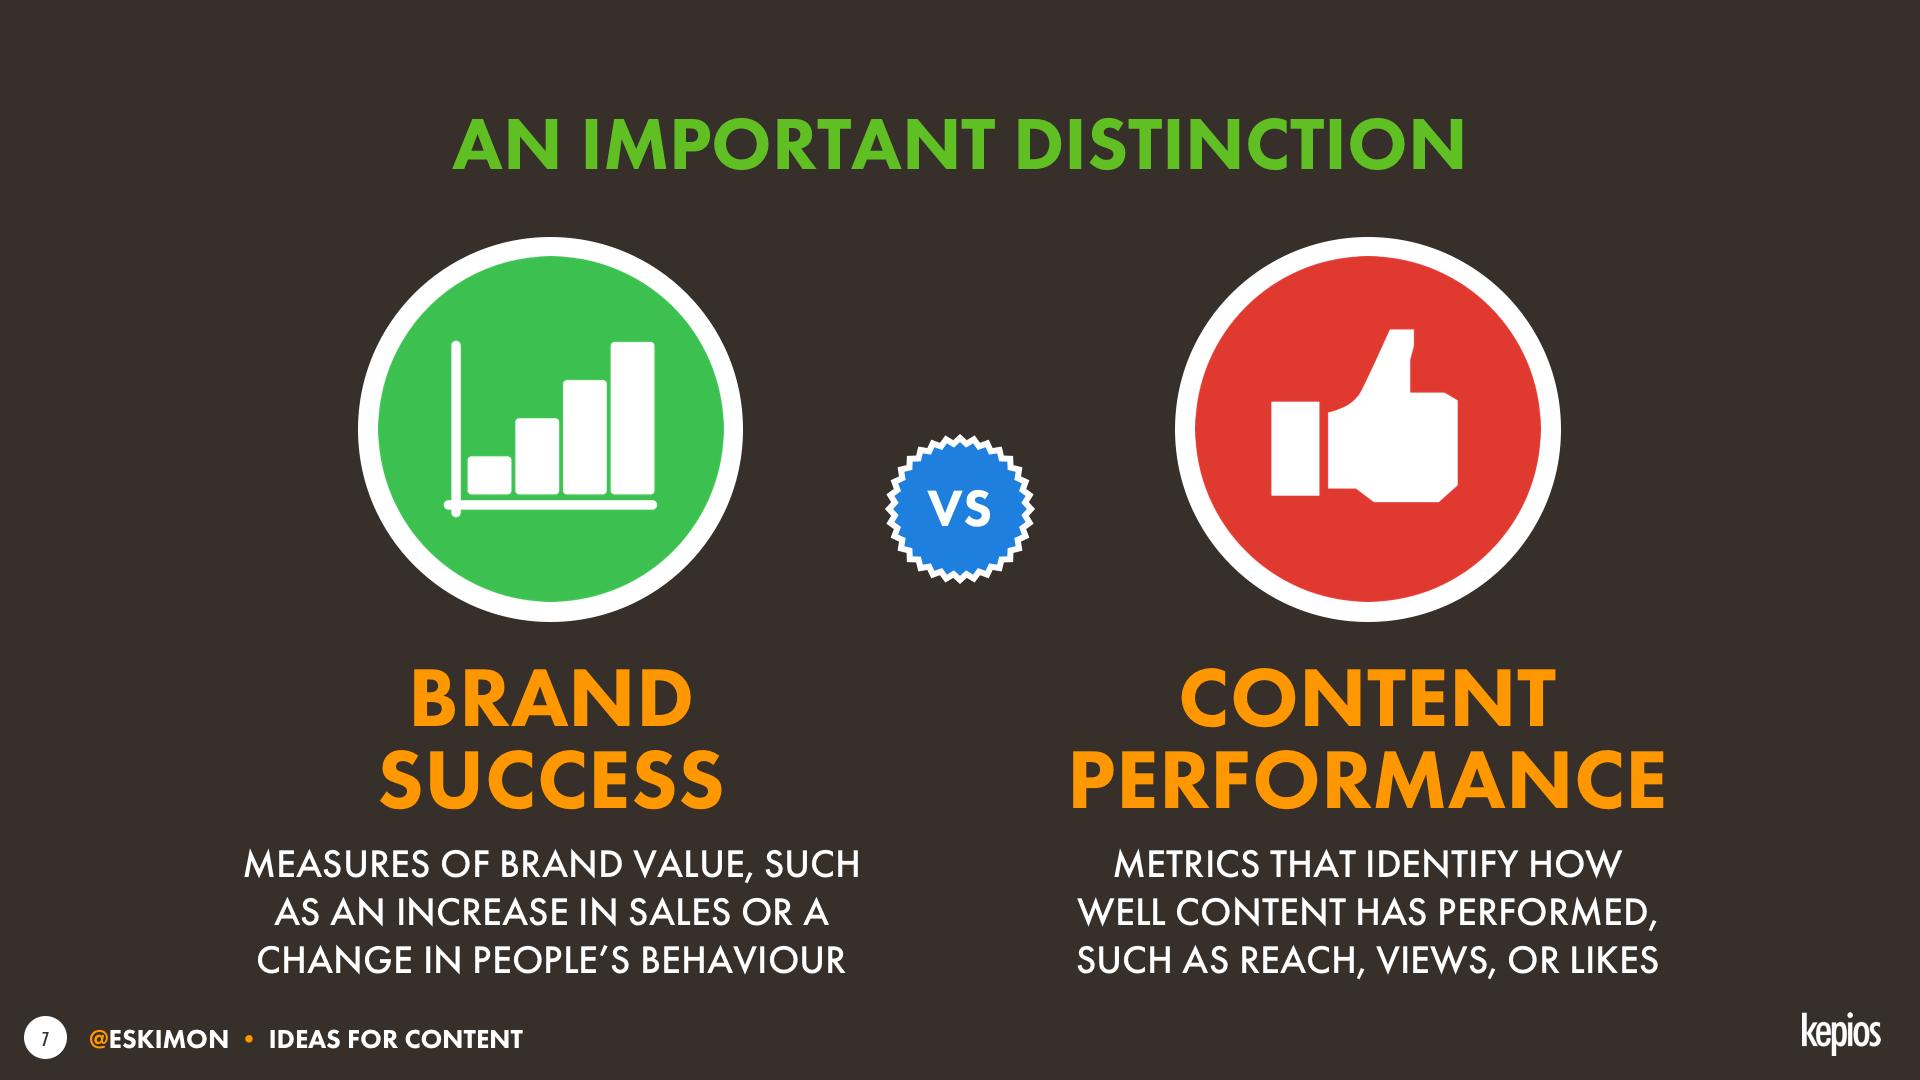 Brand Success vs Content Performance